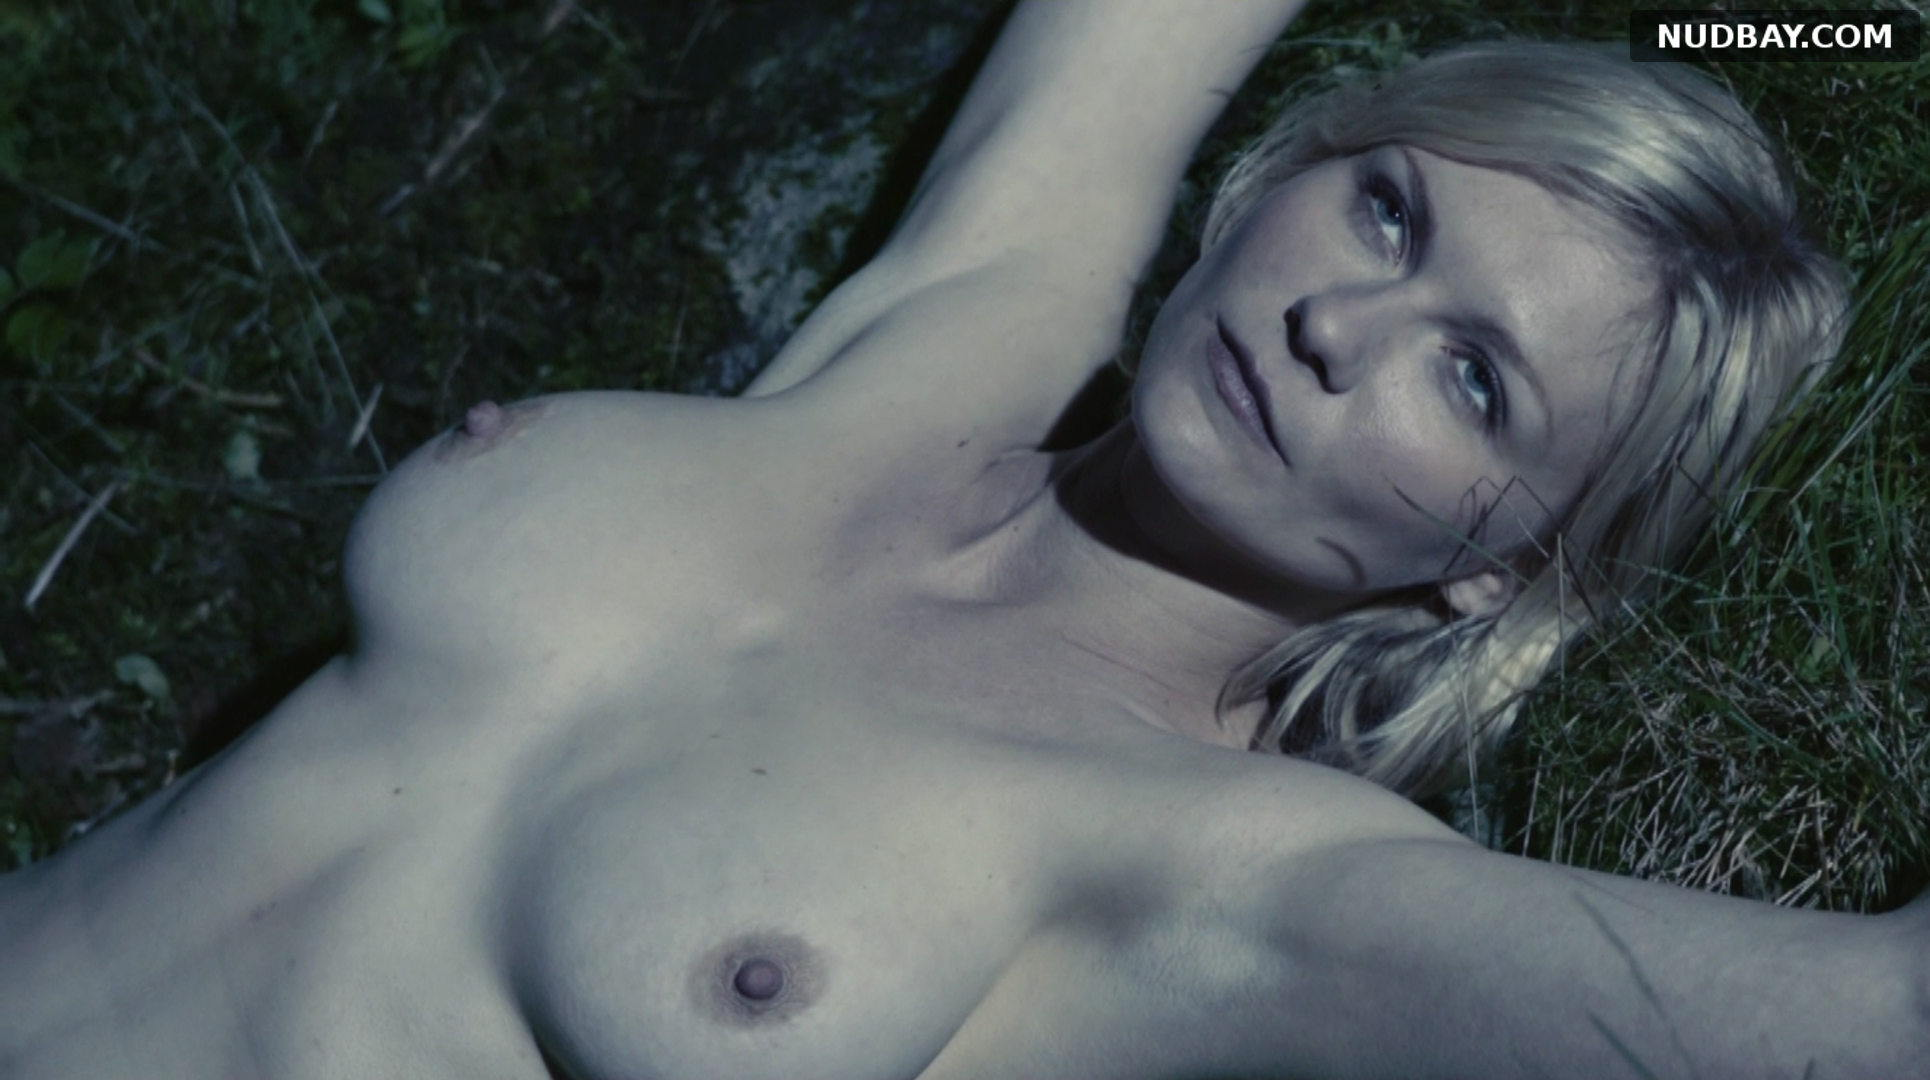 Kirsten Dunst nude in the movie Melancholia (2011)